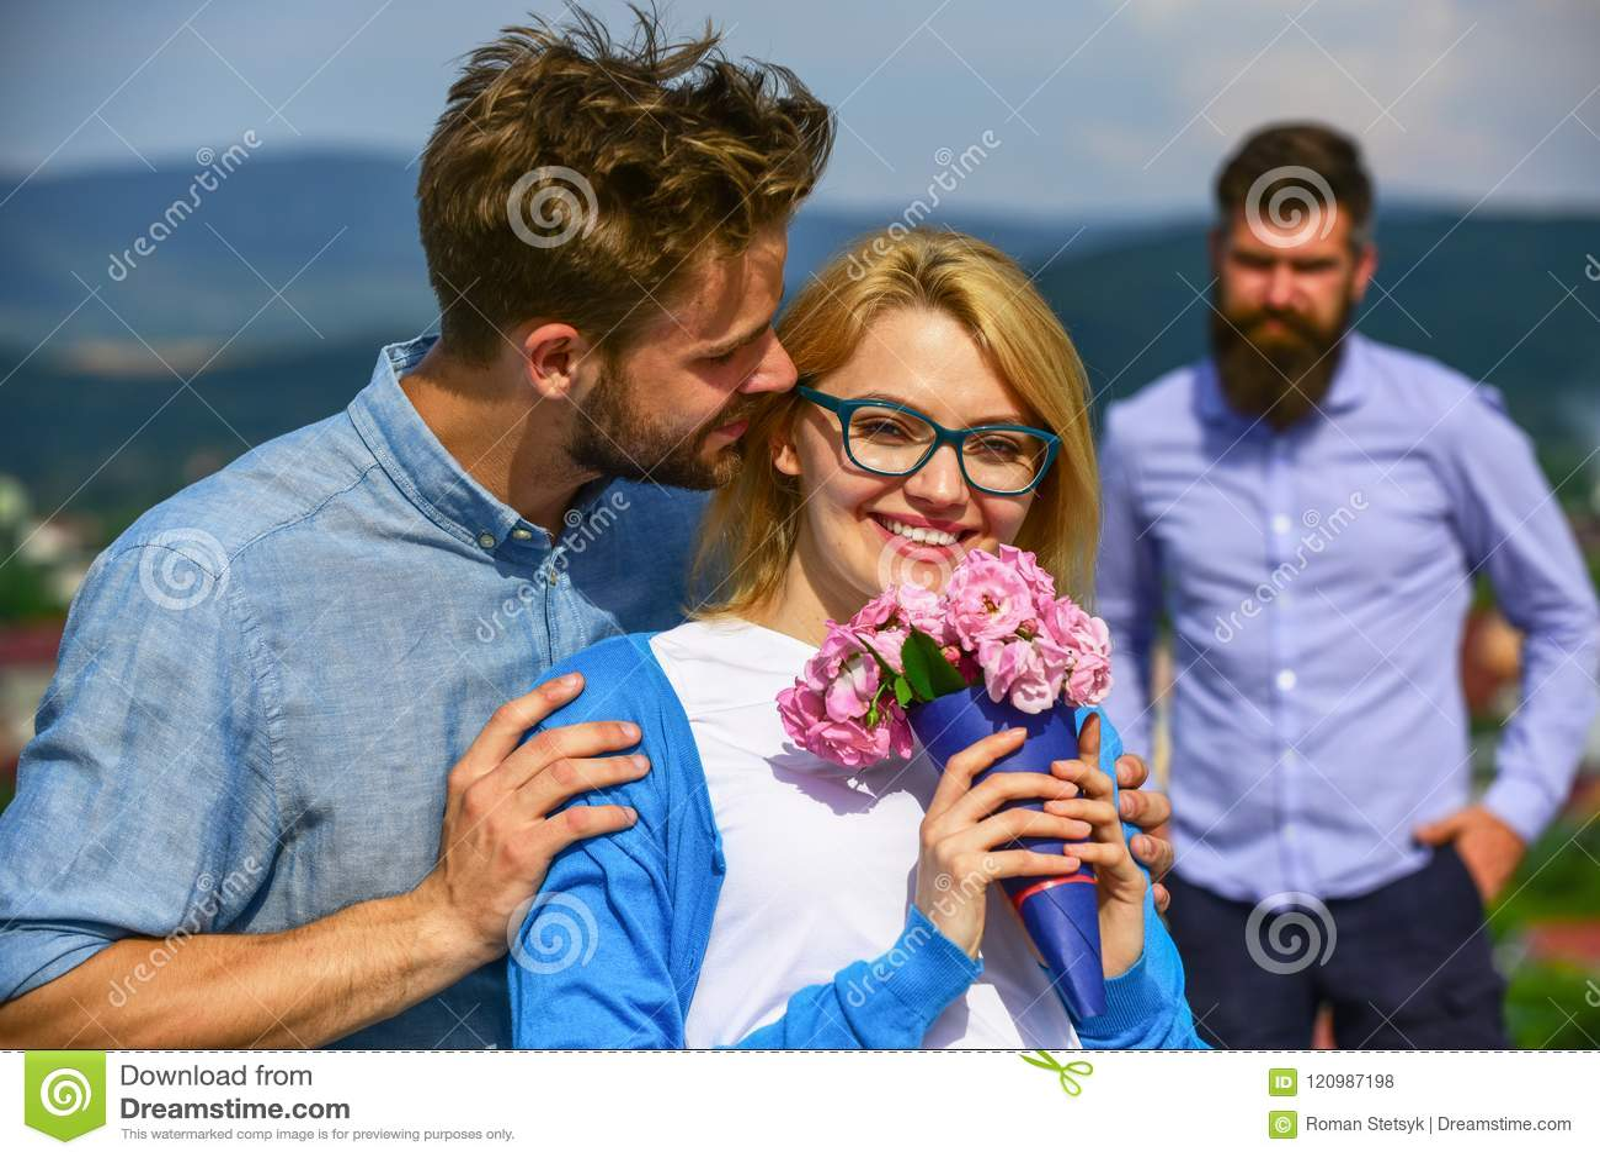 Edinichka online dating